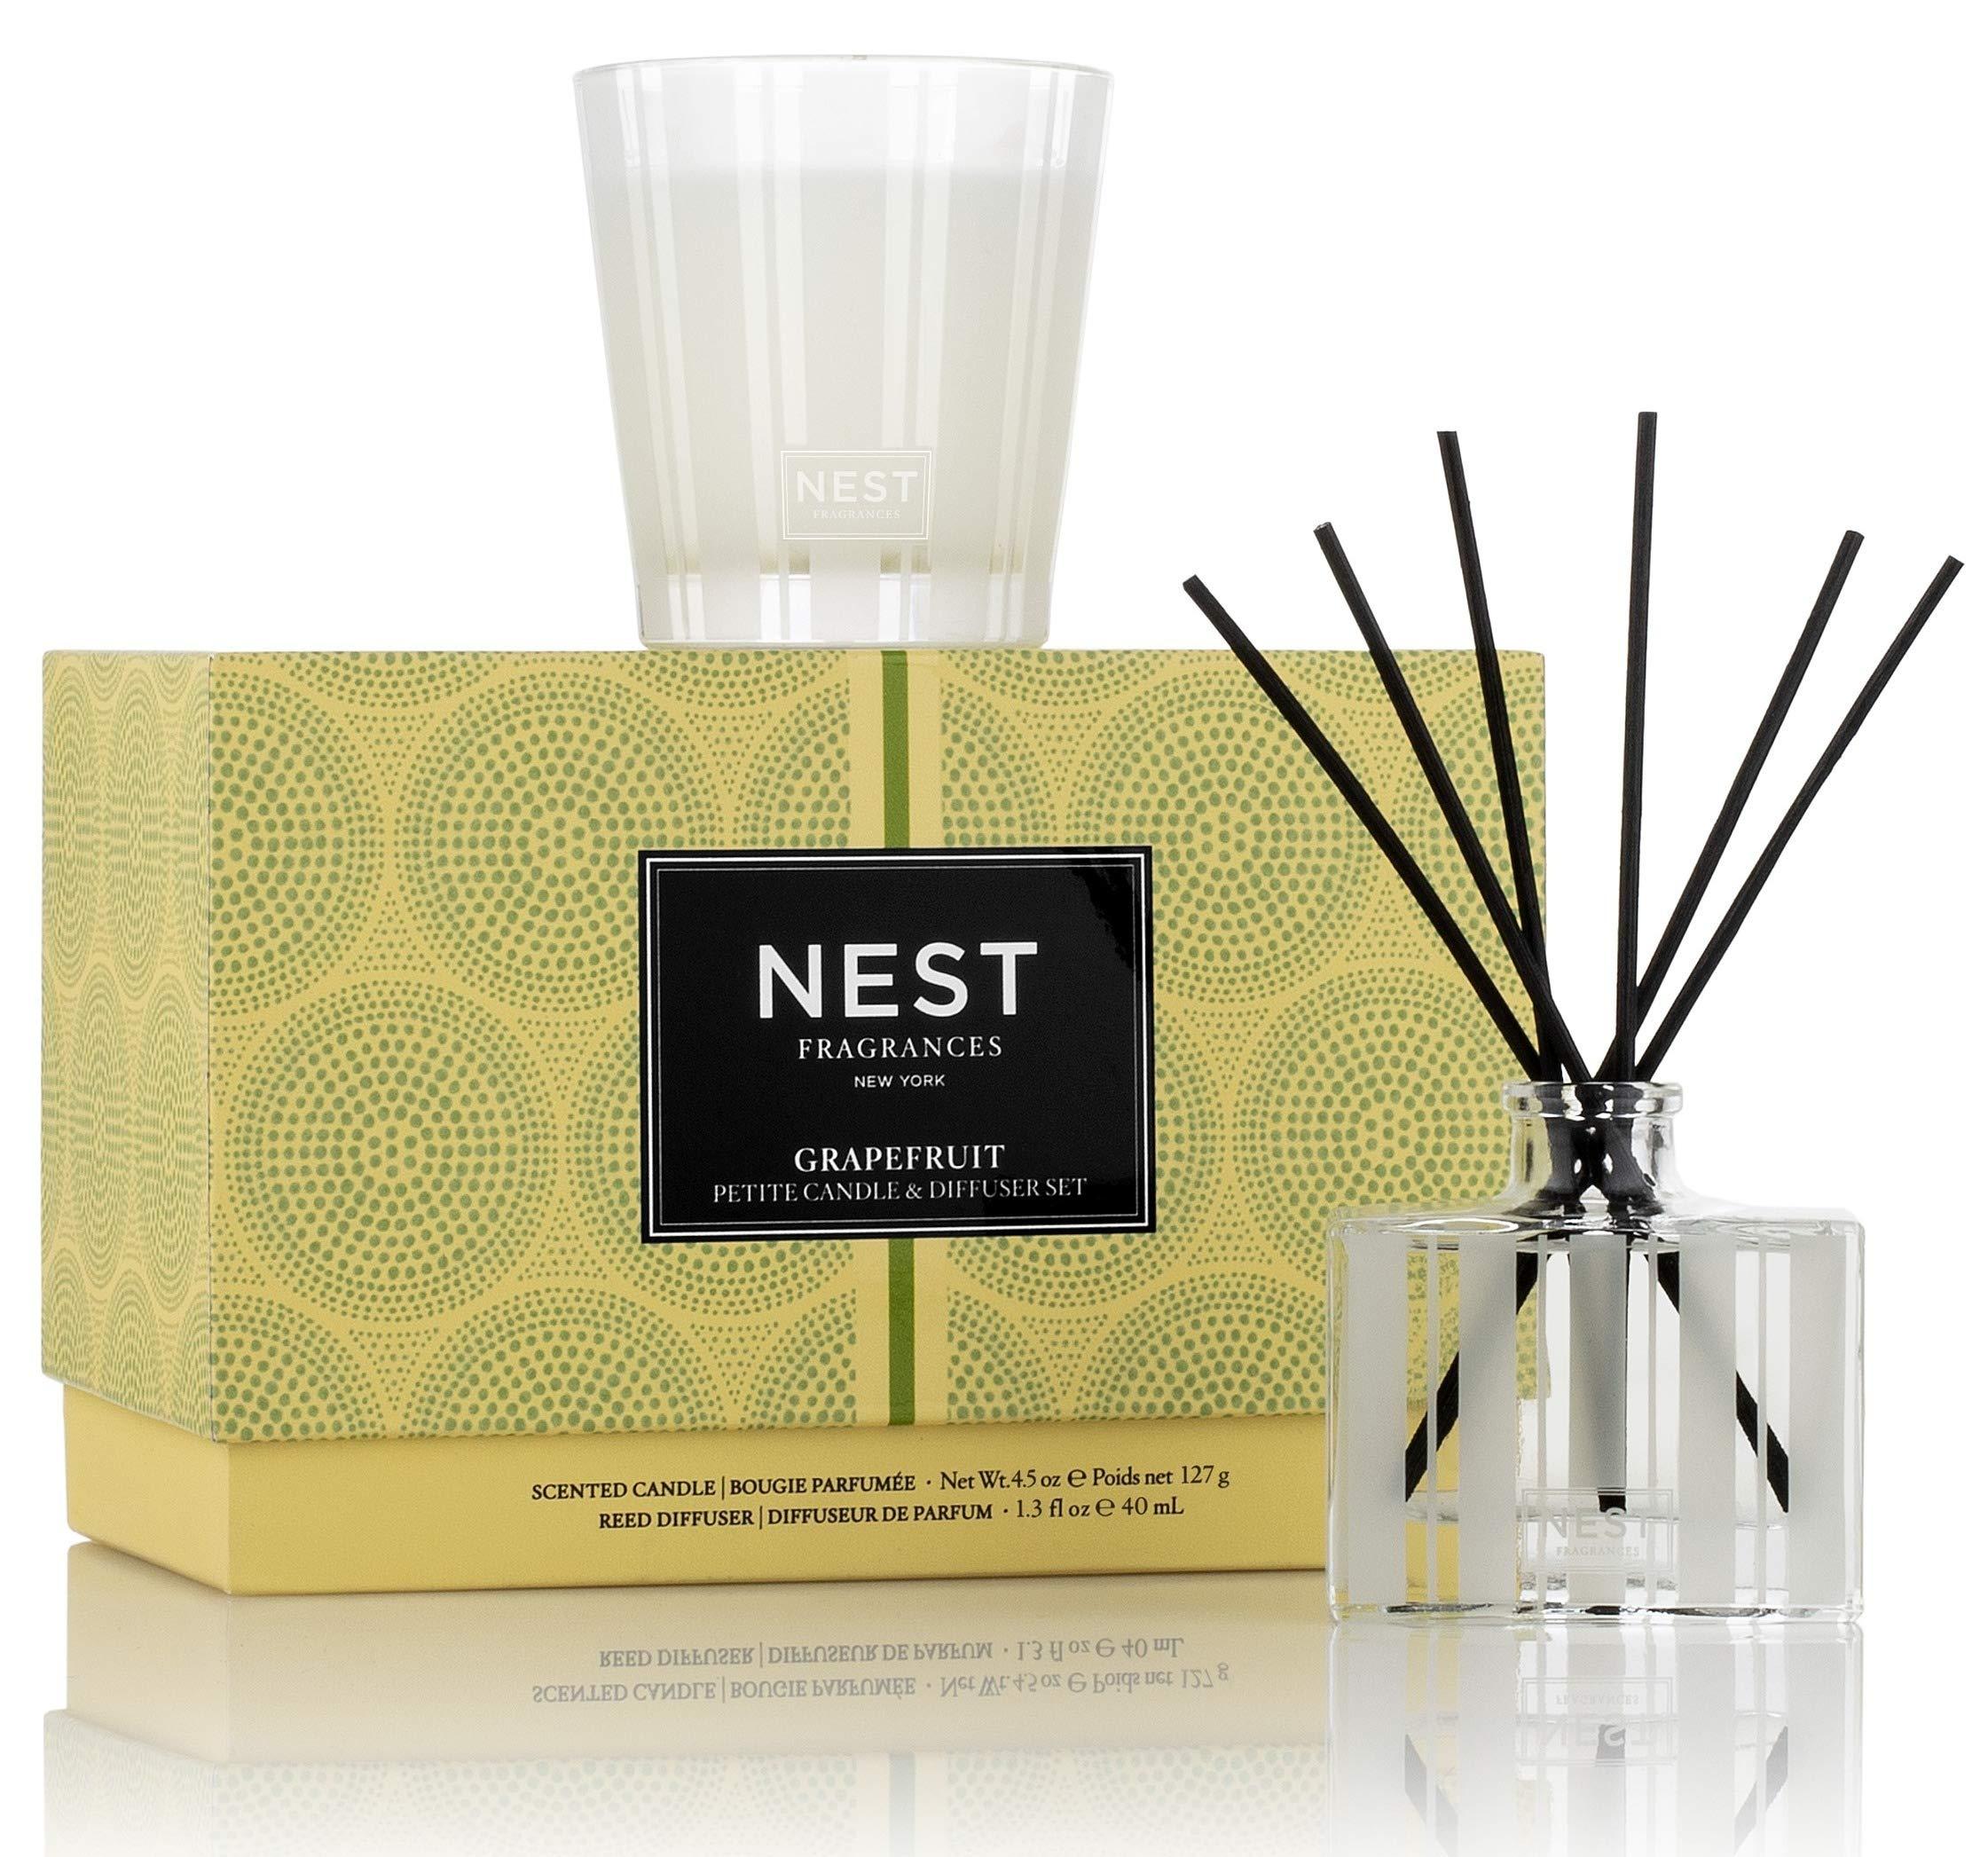 NEST Fragrances Grapefruit Petite Candle & Reed Diffuser Set by NEST Fragrances (Image #2)